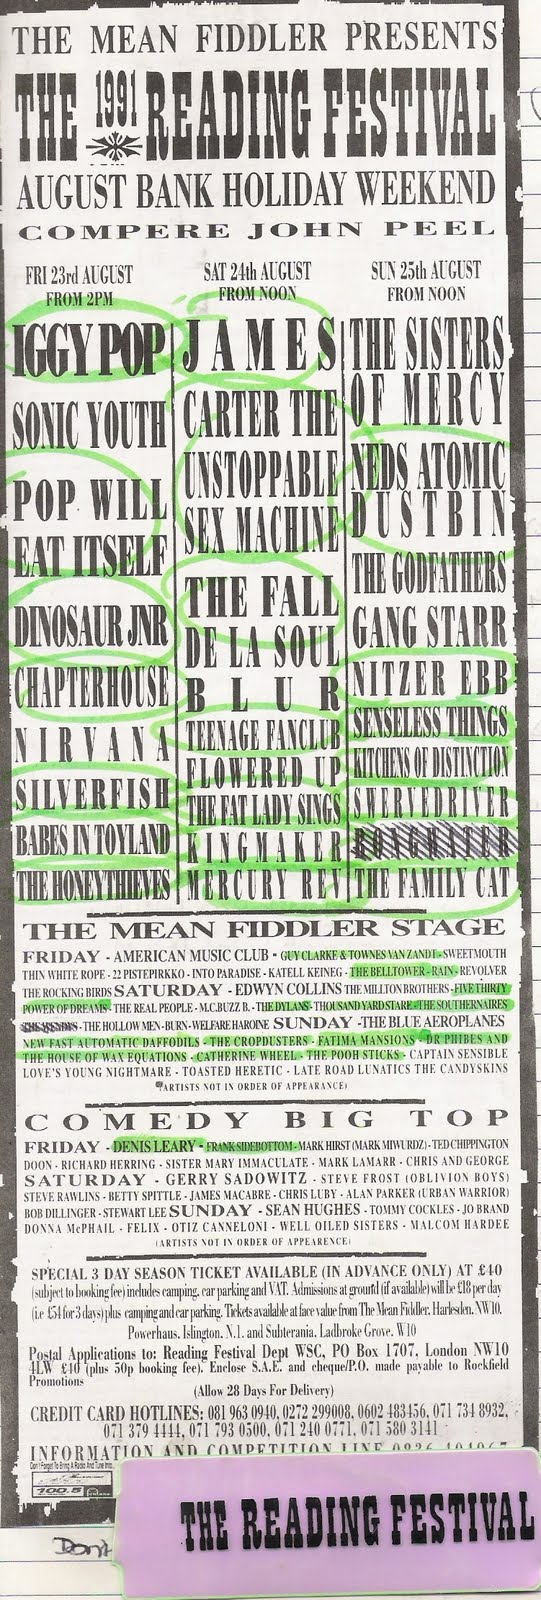 191 THE 1991 READING FESTIVAL